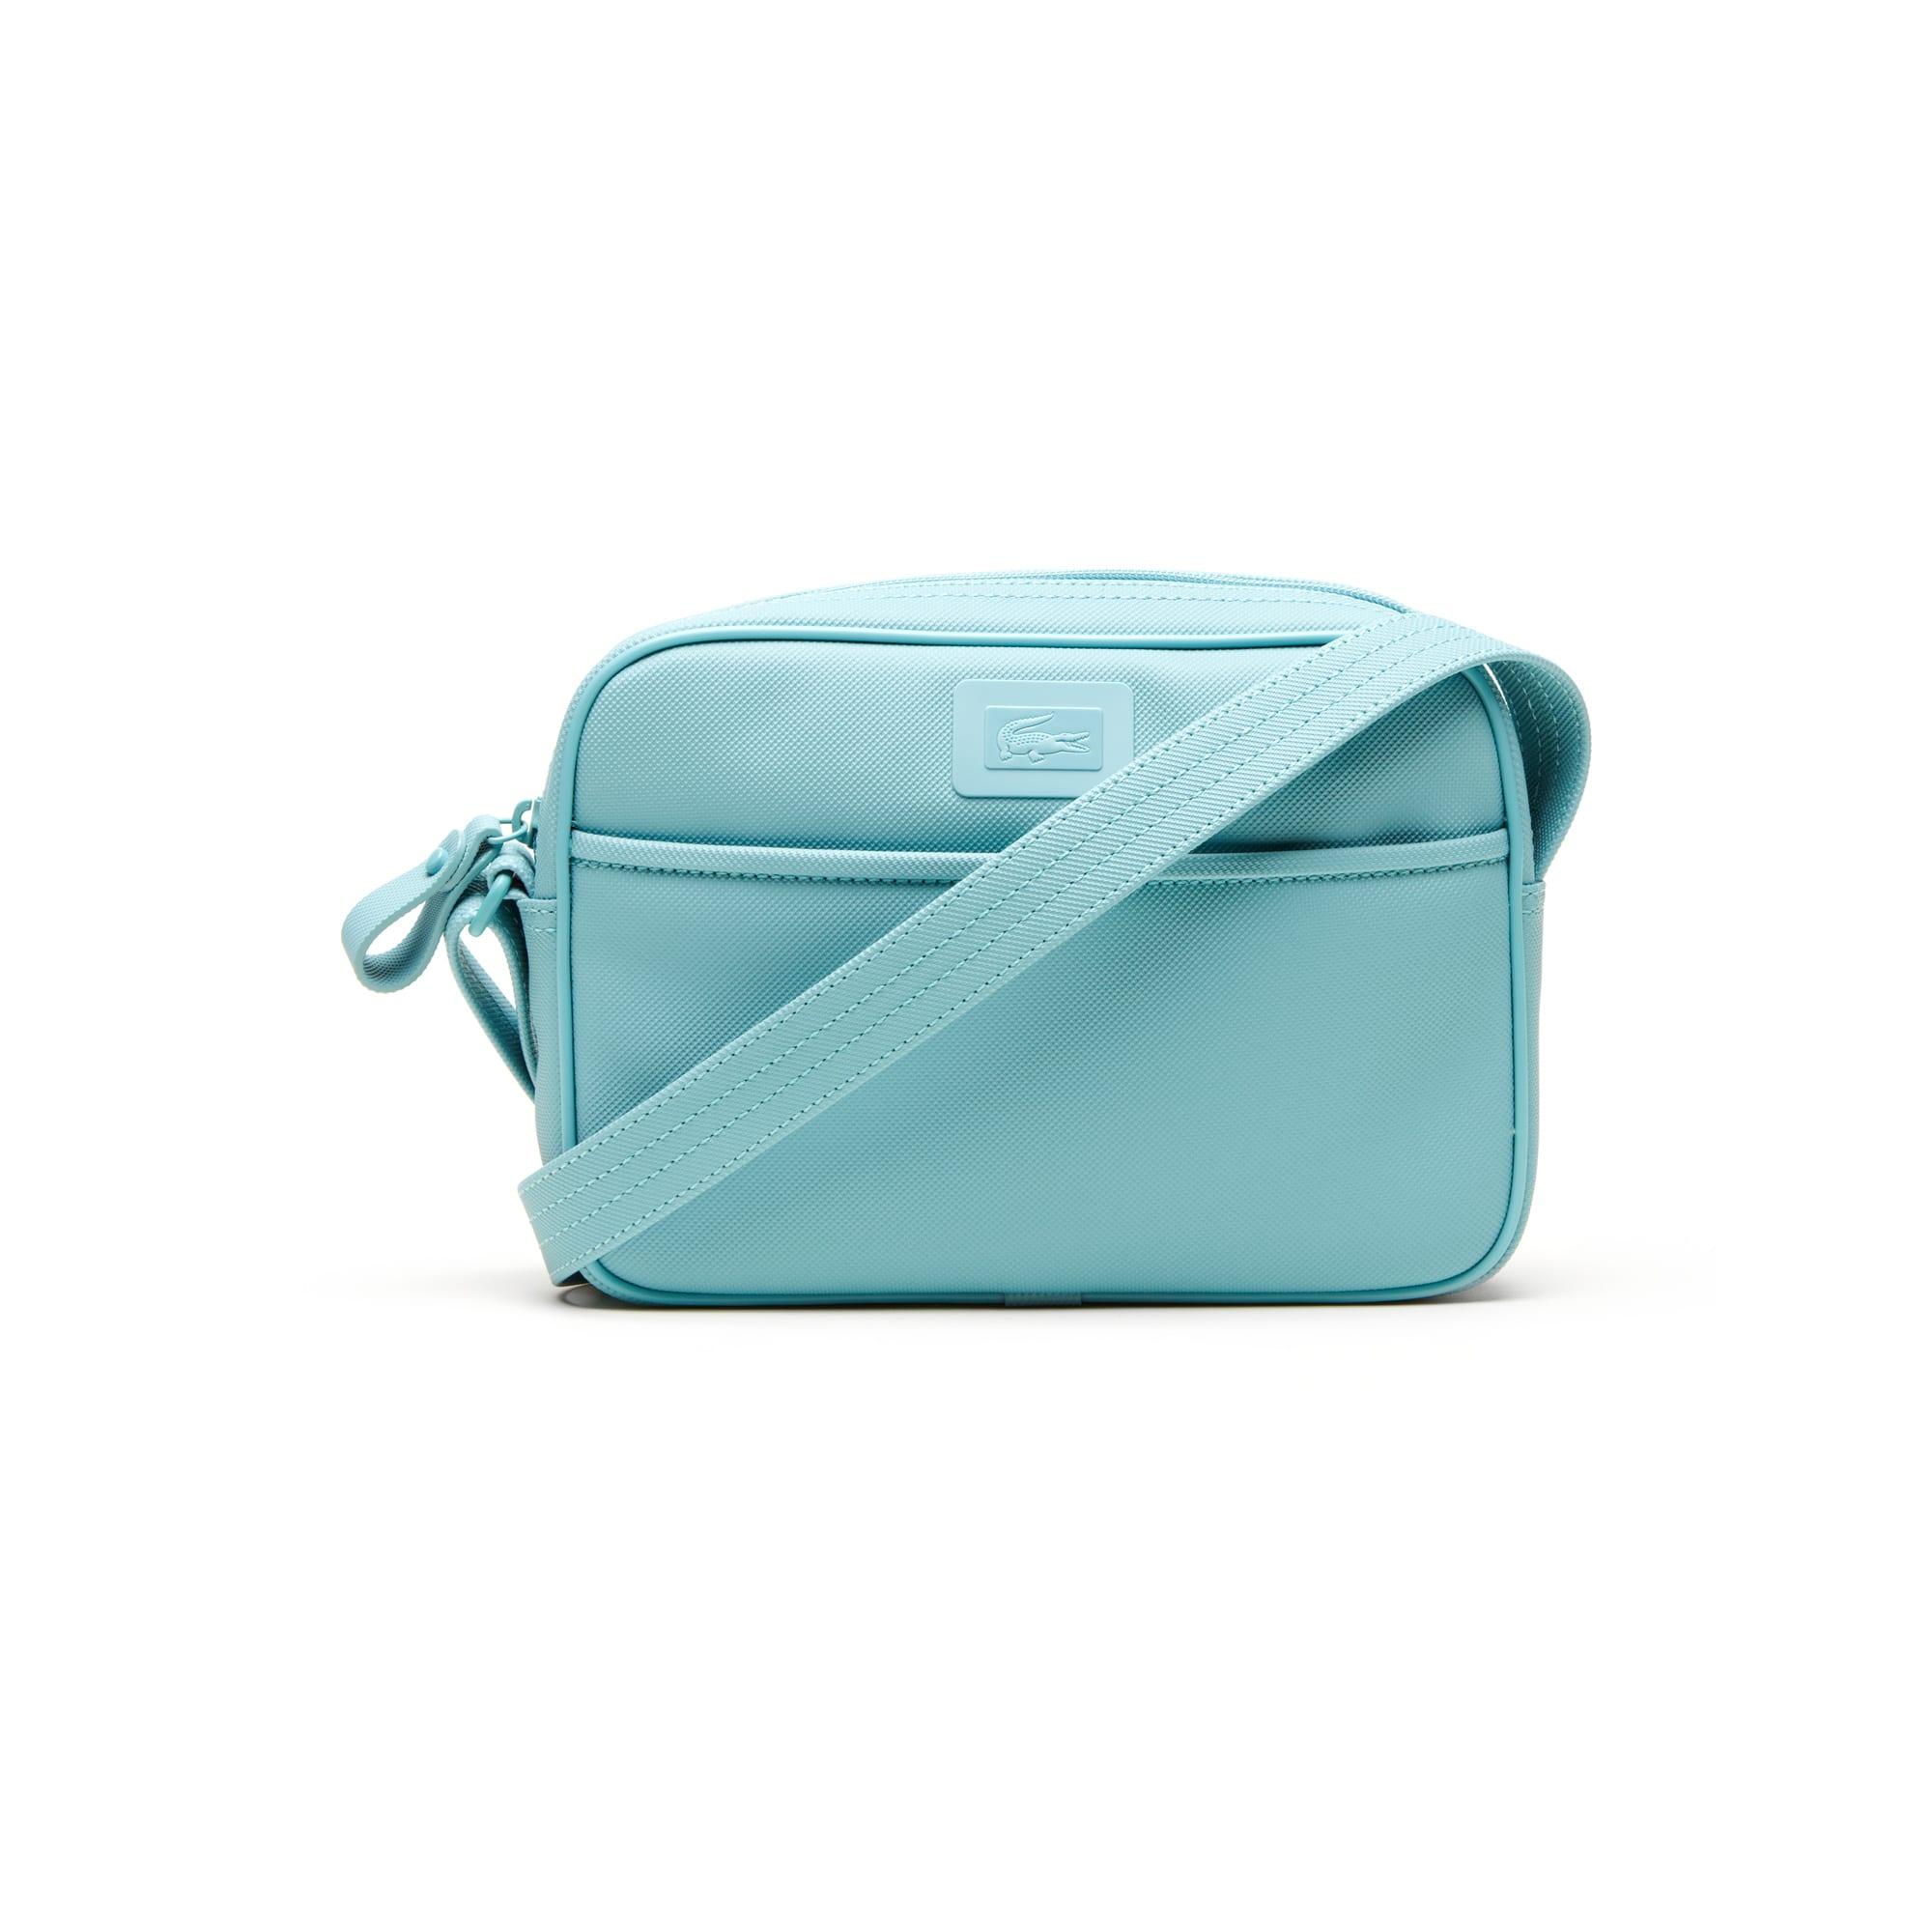 Bolsa tiracolo WOMEN'S CLASSIC pequena